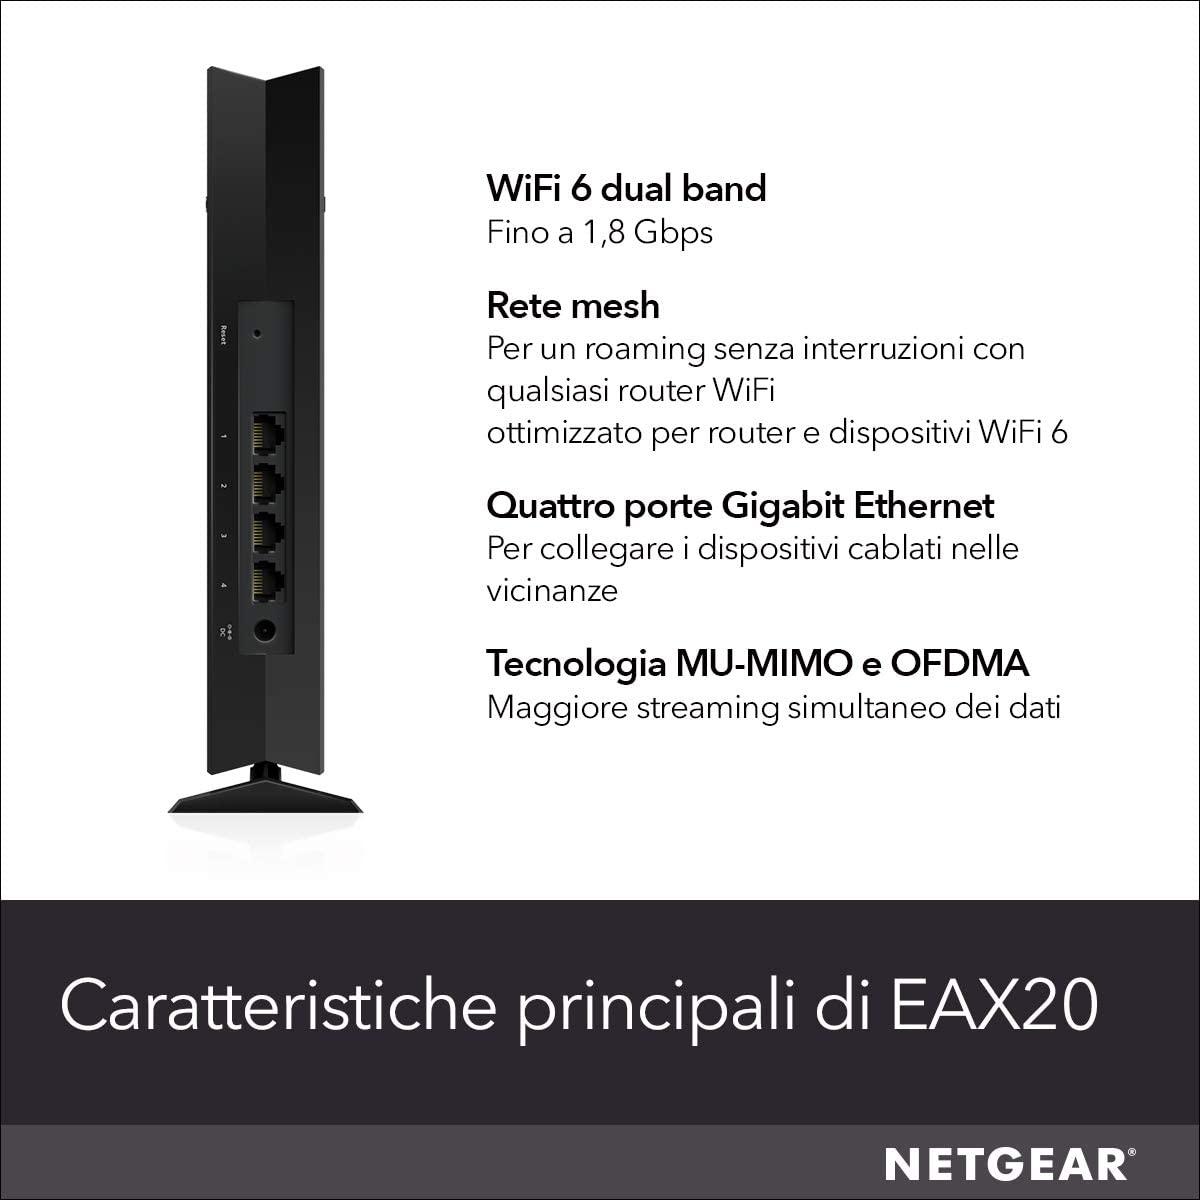 Netgear EAX20 - Wi-Fi-Range-Extender - 4 Anschlüsse